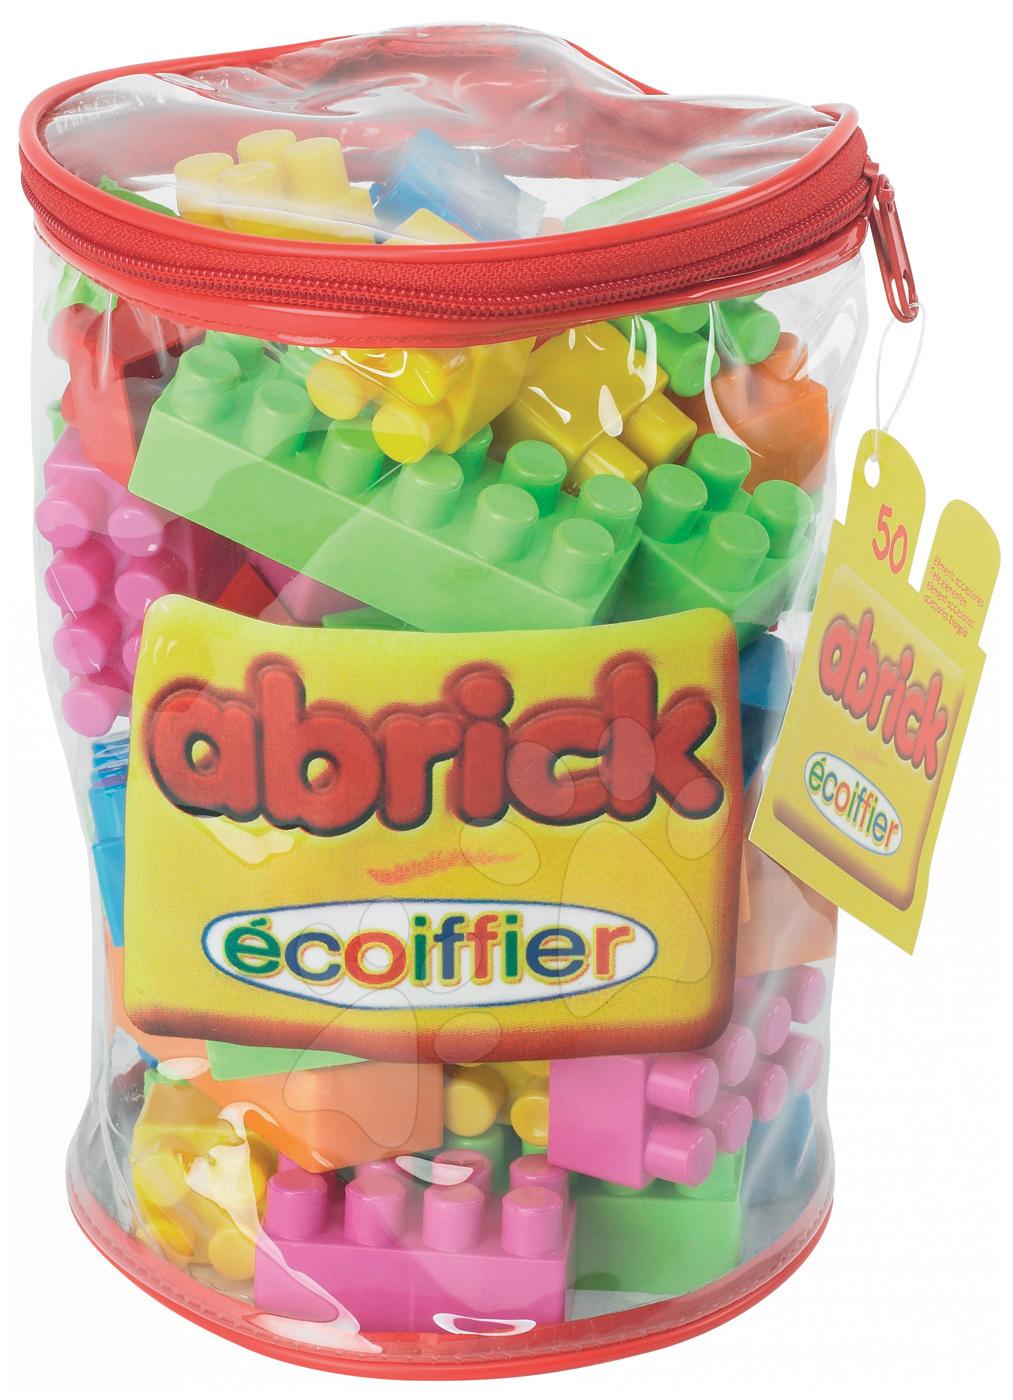 Otroške kocke Abrick - Otroške kocke Abrick Écoiffier v vreči 50 delov od 18 mes